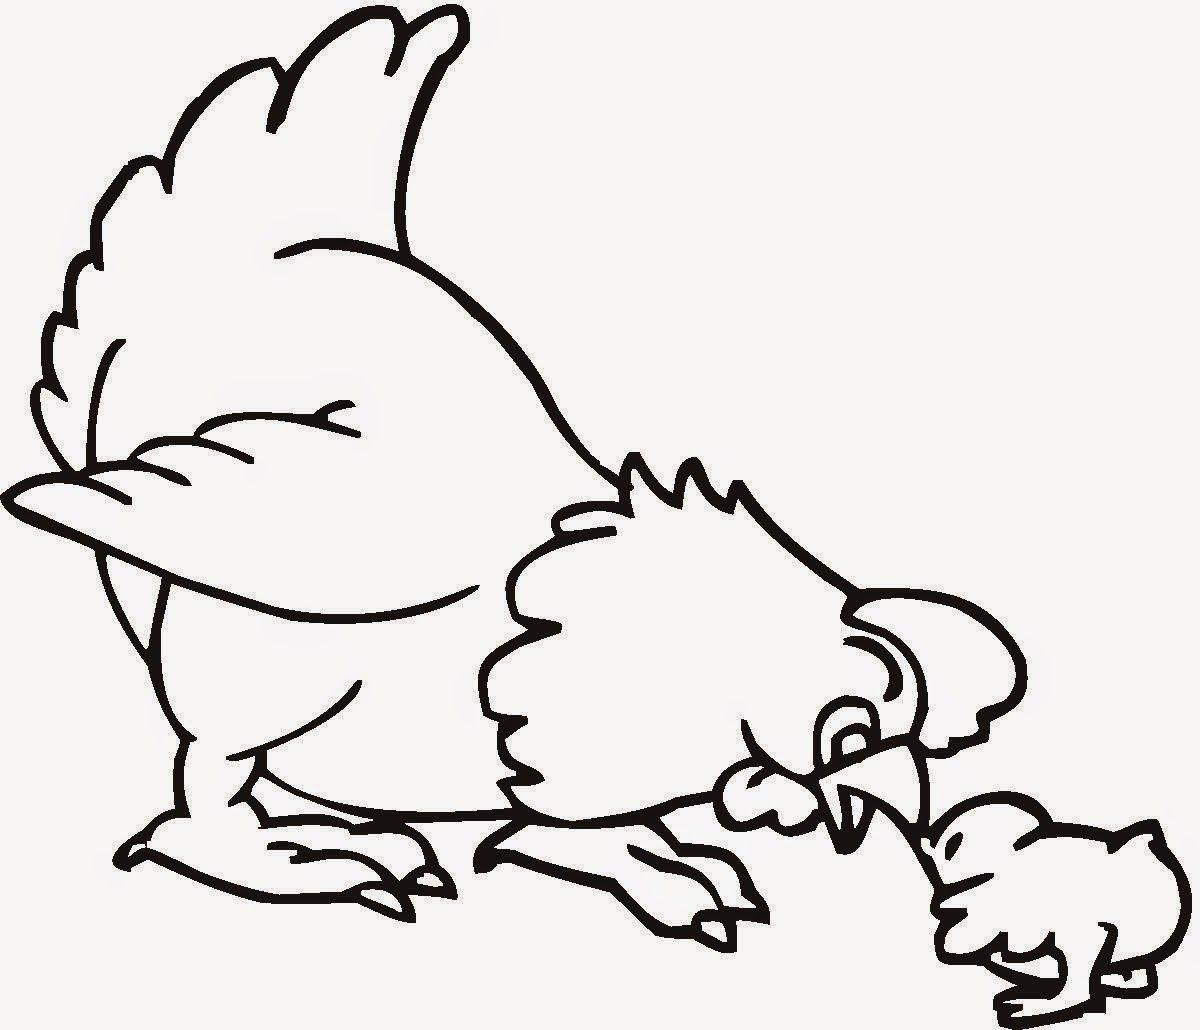 Farm animals coloring pages coloringsuite coloring books